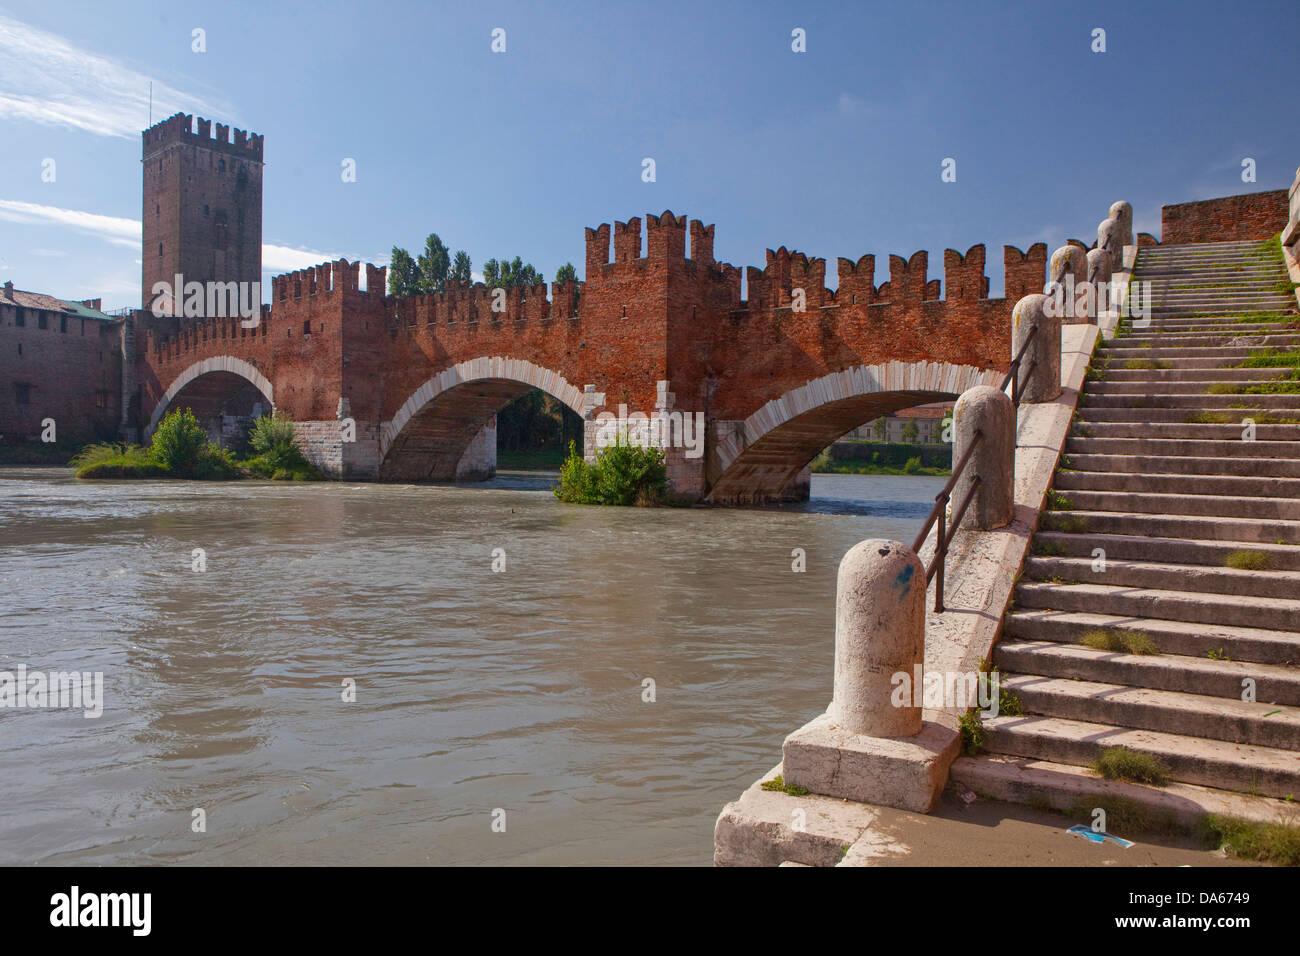 Castelveccio, Ponte Scaligero, Verona, Adige, panorama, town, city, Italy, Europe, bridge, fort - Stock Image